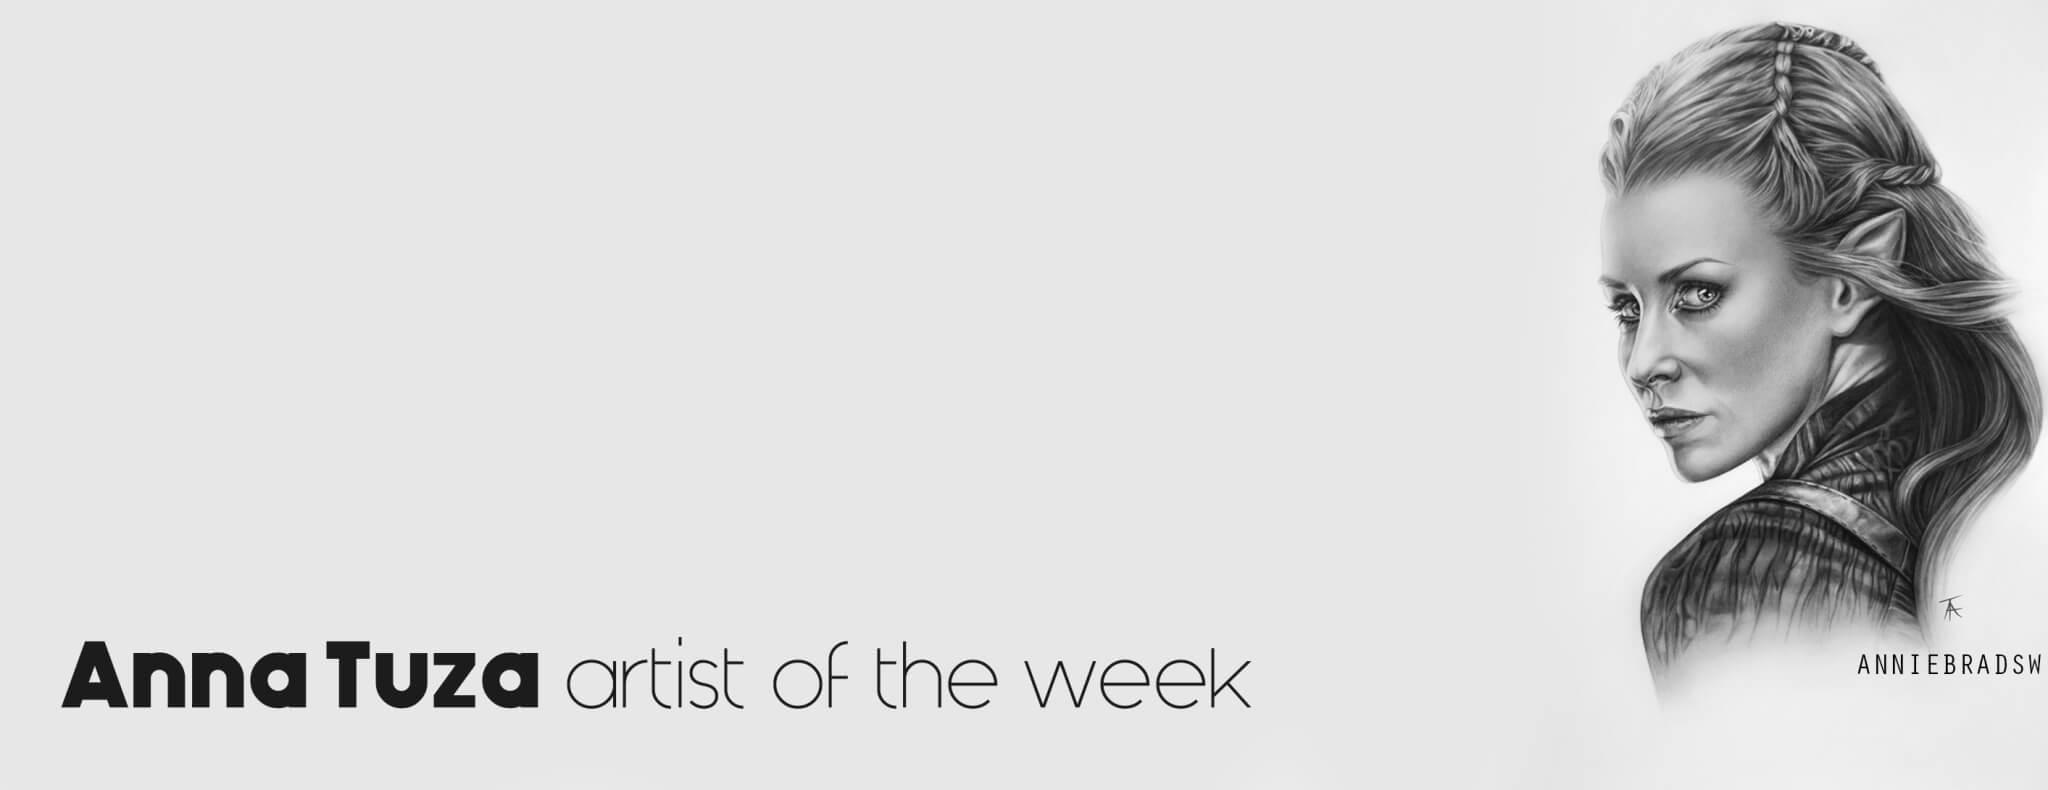 Anna Tuza artist of the week